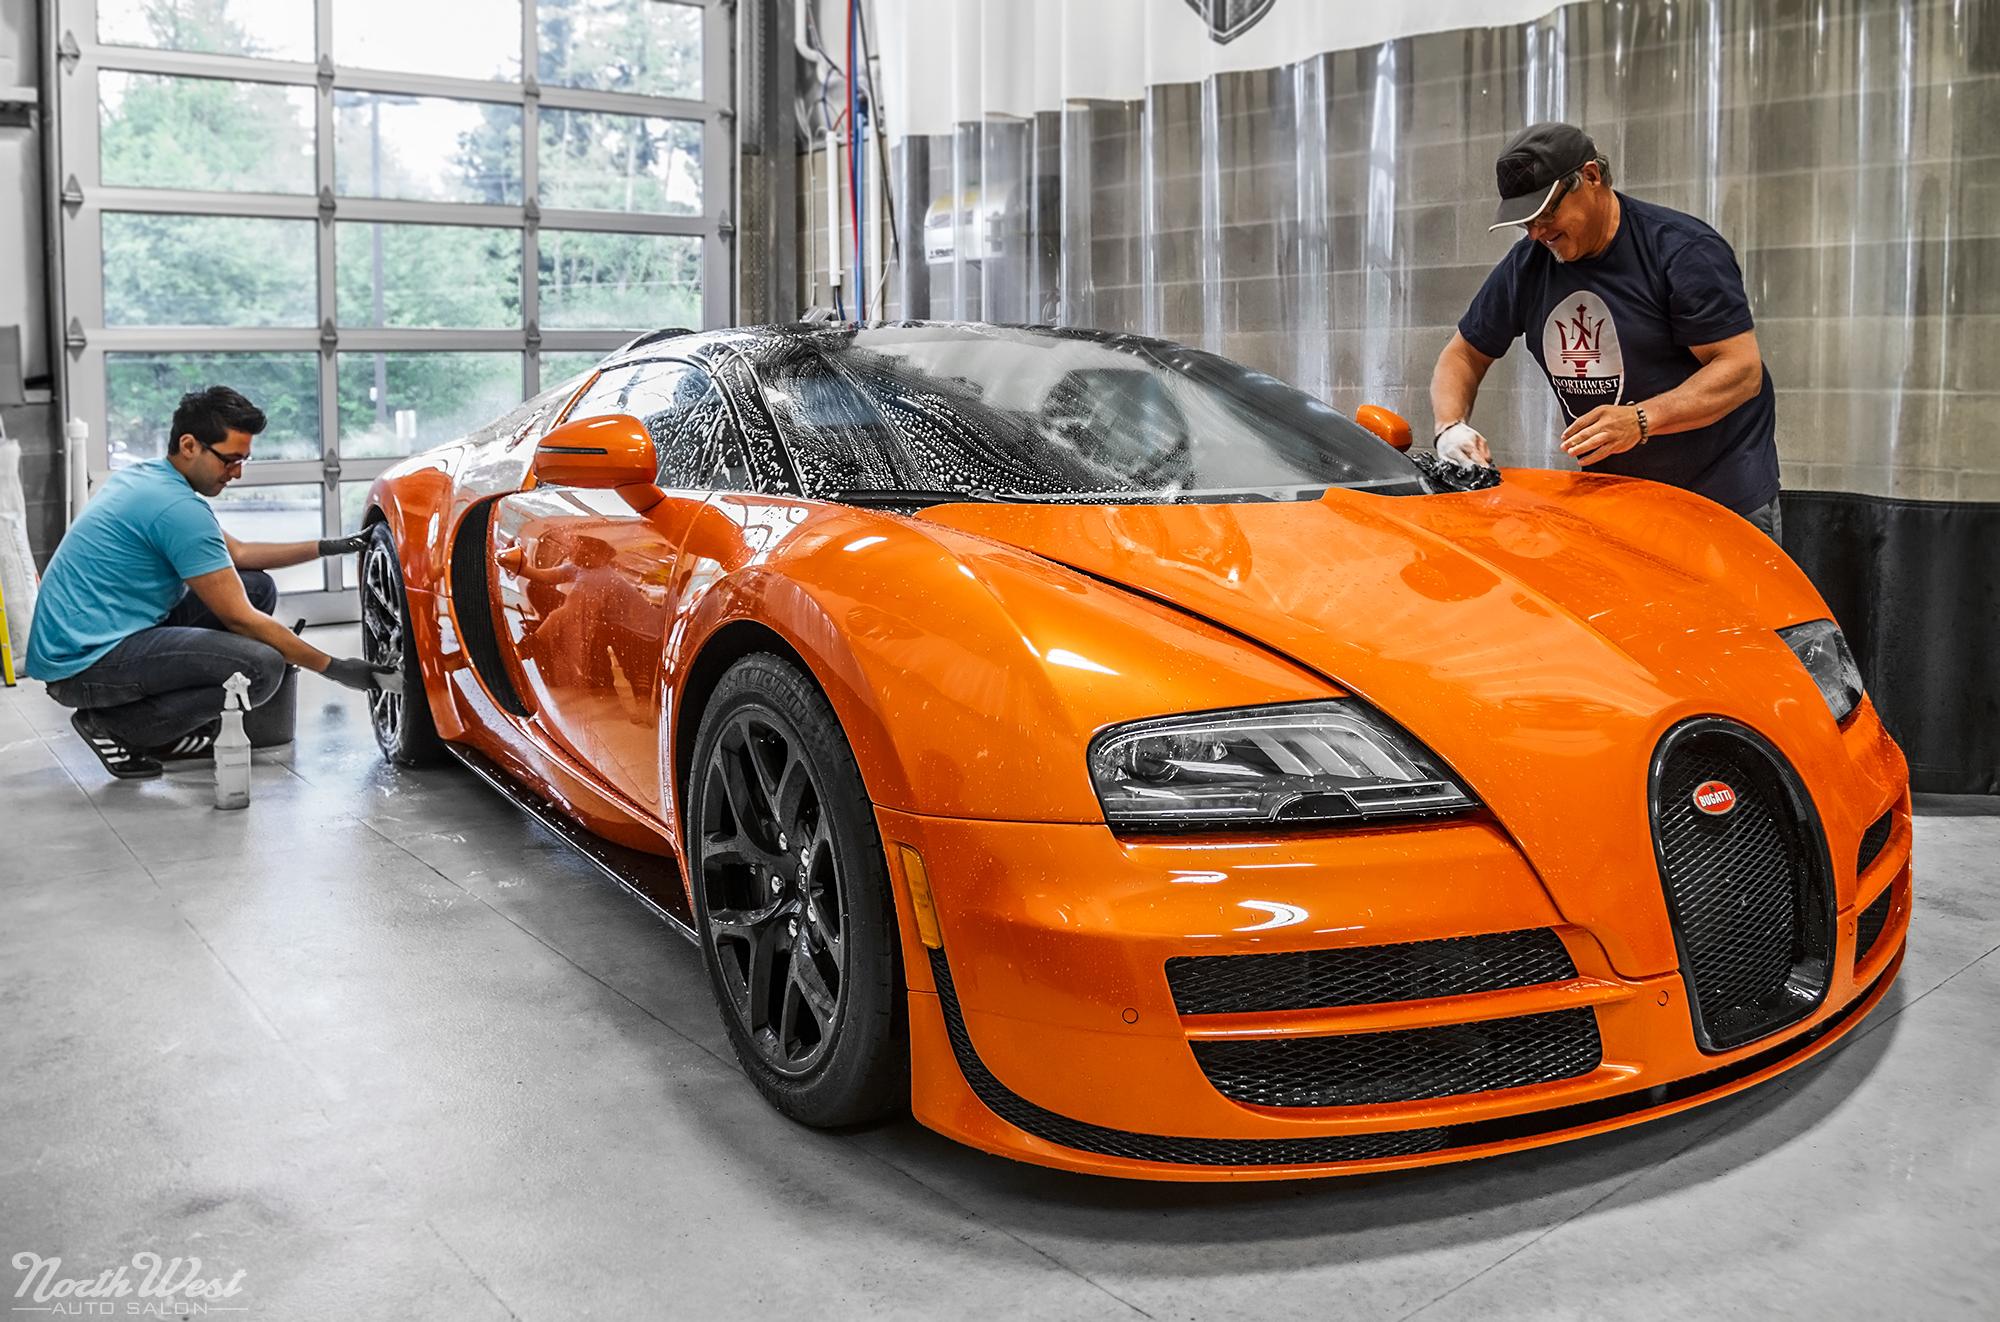 Bugatti-Veyron-Grand-Sport-Vitesse-detailed-NorthWest-Auto-Salon-handwash Amazing Bugatti Veyron Grand Sport Vitesse Information Cars Trend